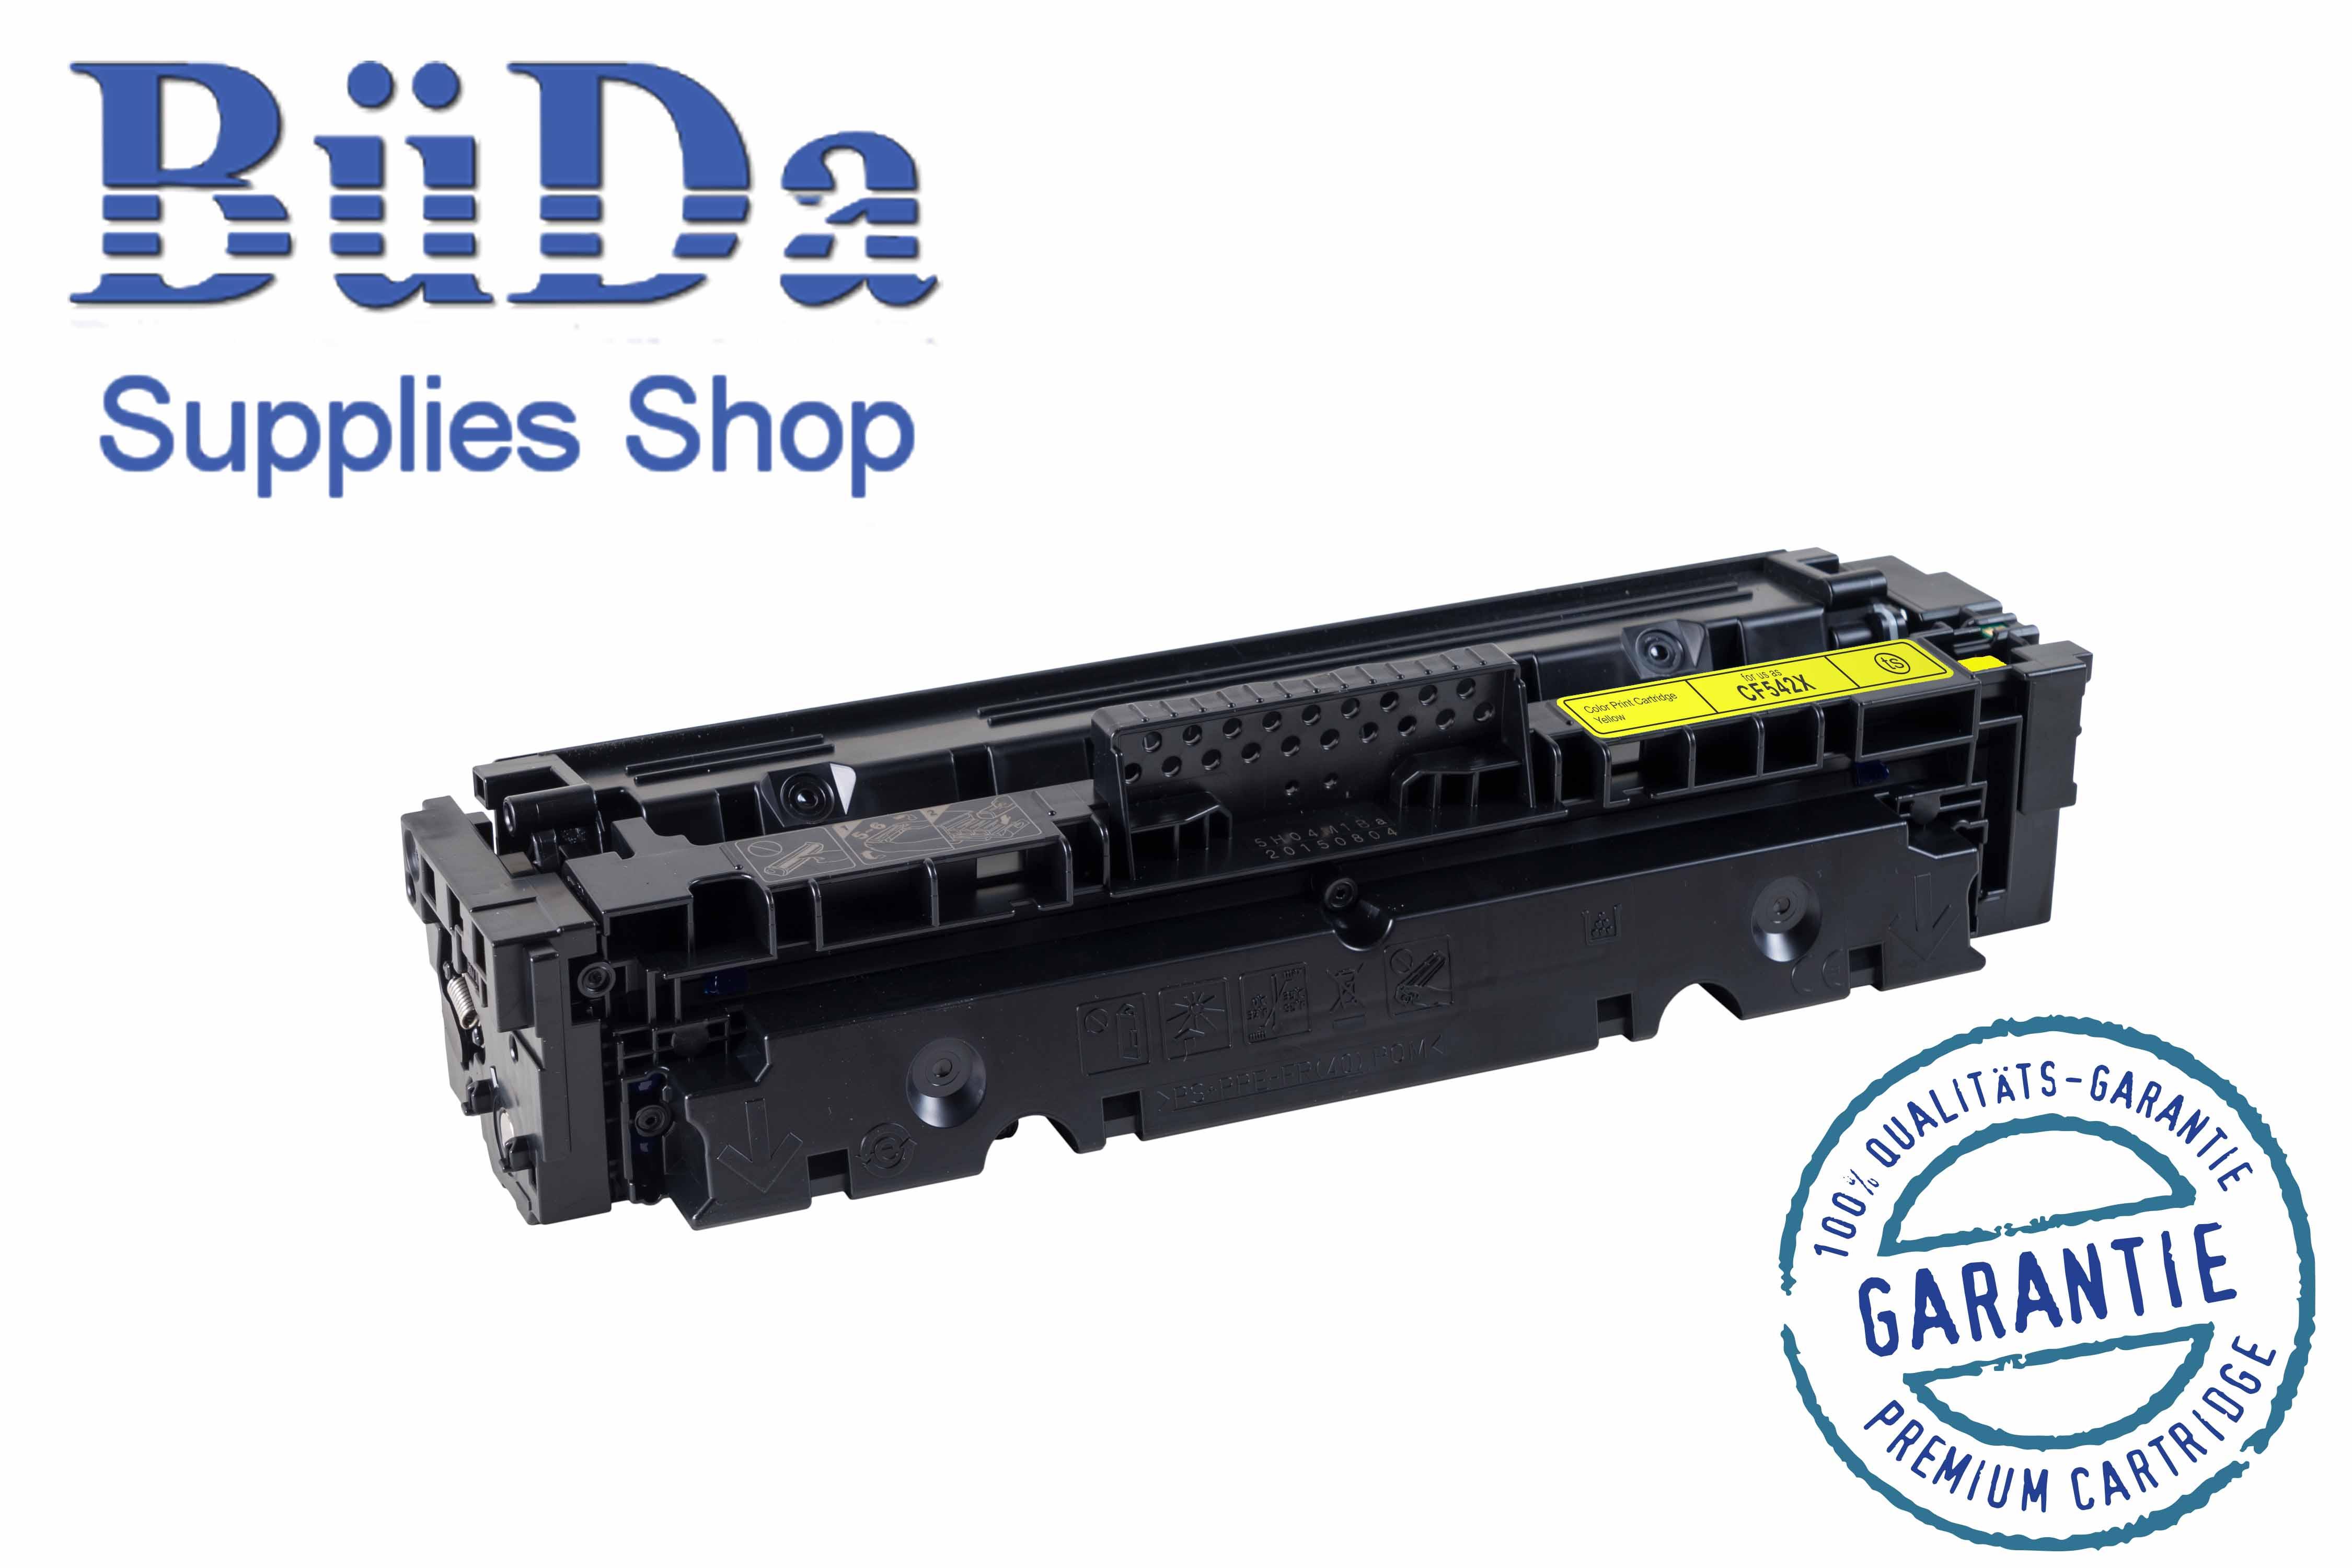 Toner-Modul komp. zu CF542X / 203X yellow 2500 Seiten